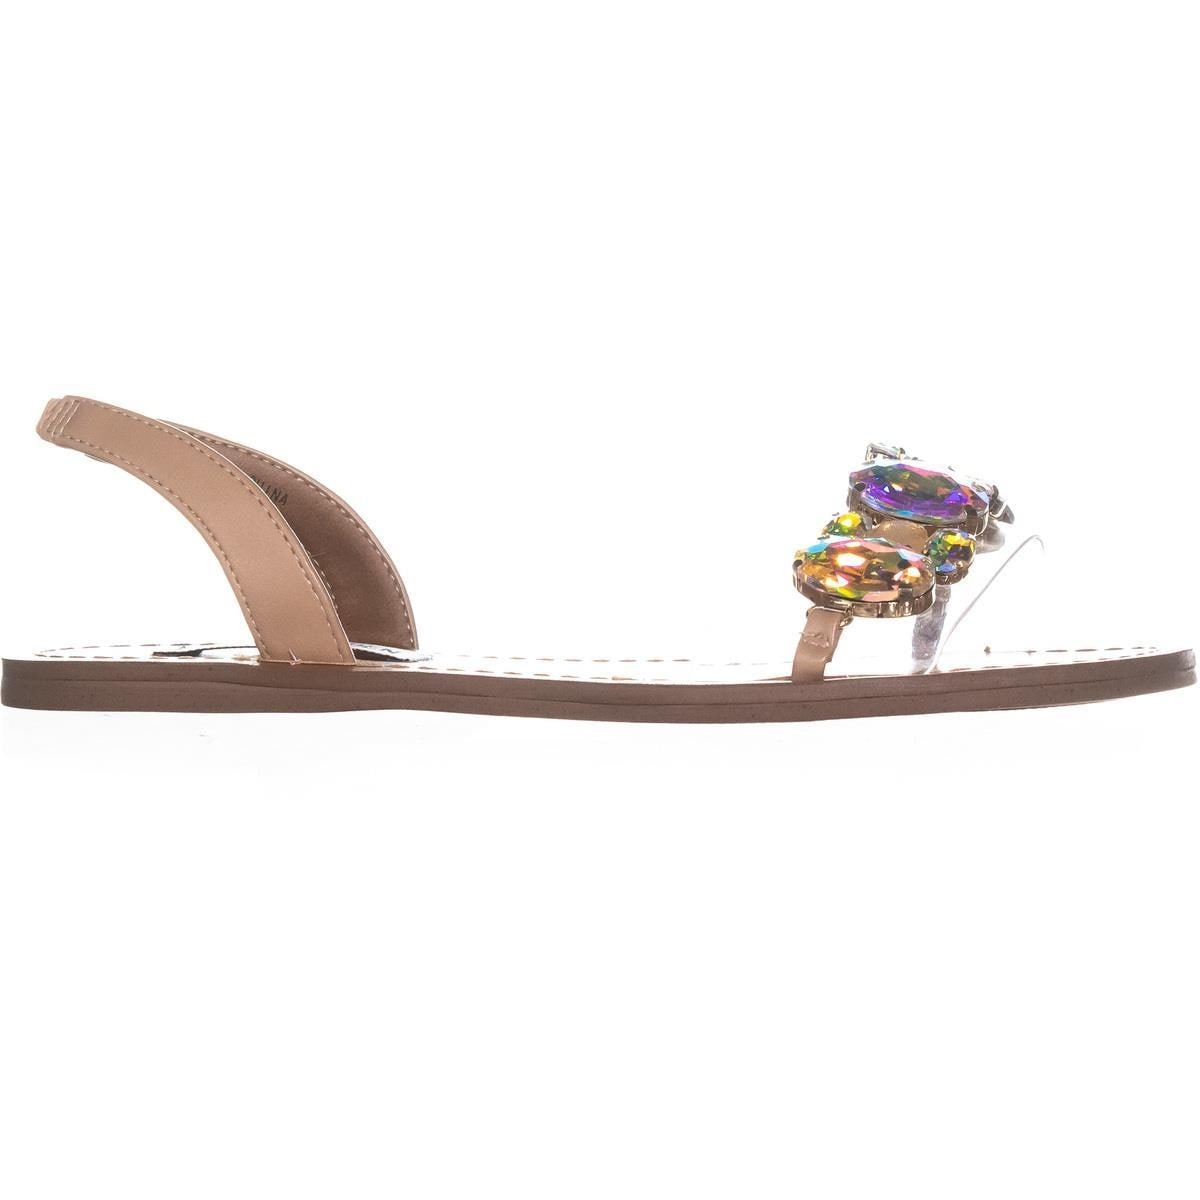 06aa466ad6e Shop Steve Madden Alice Gemstone Slip On Sandals